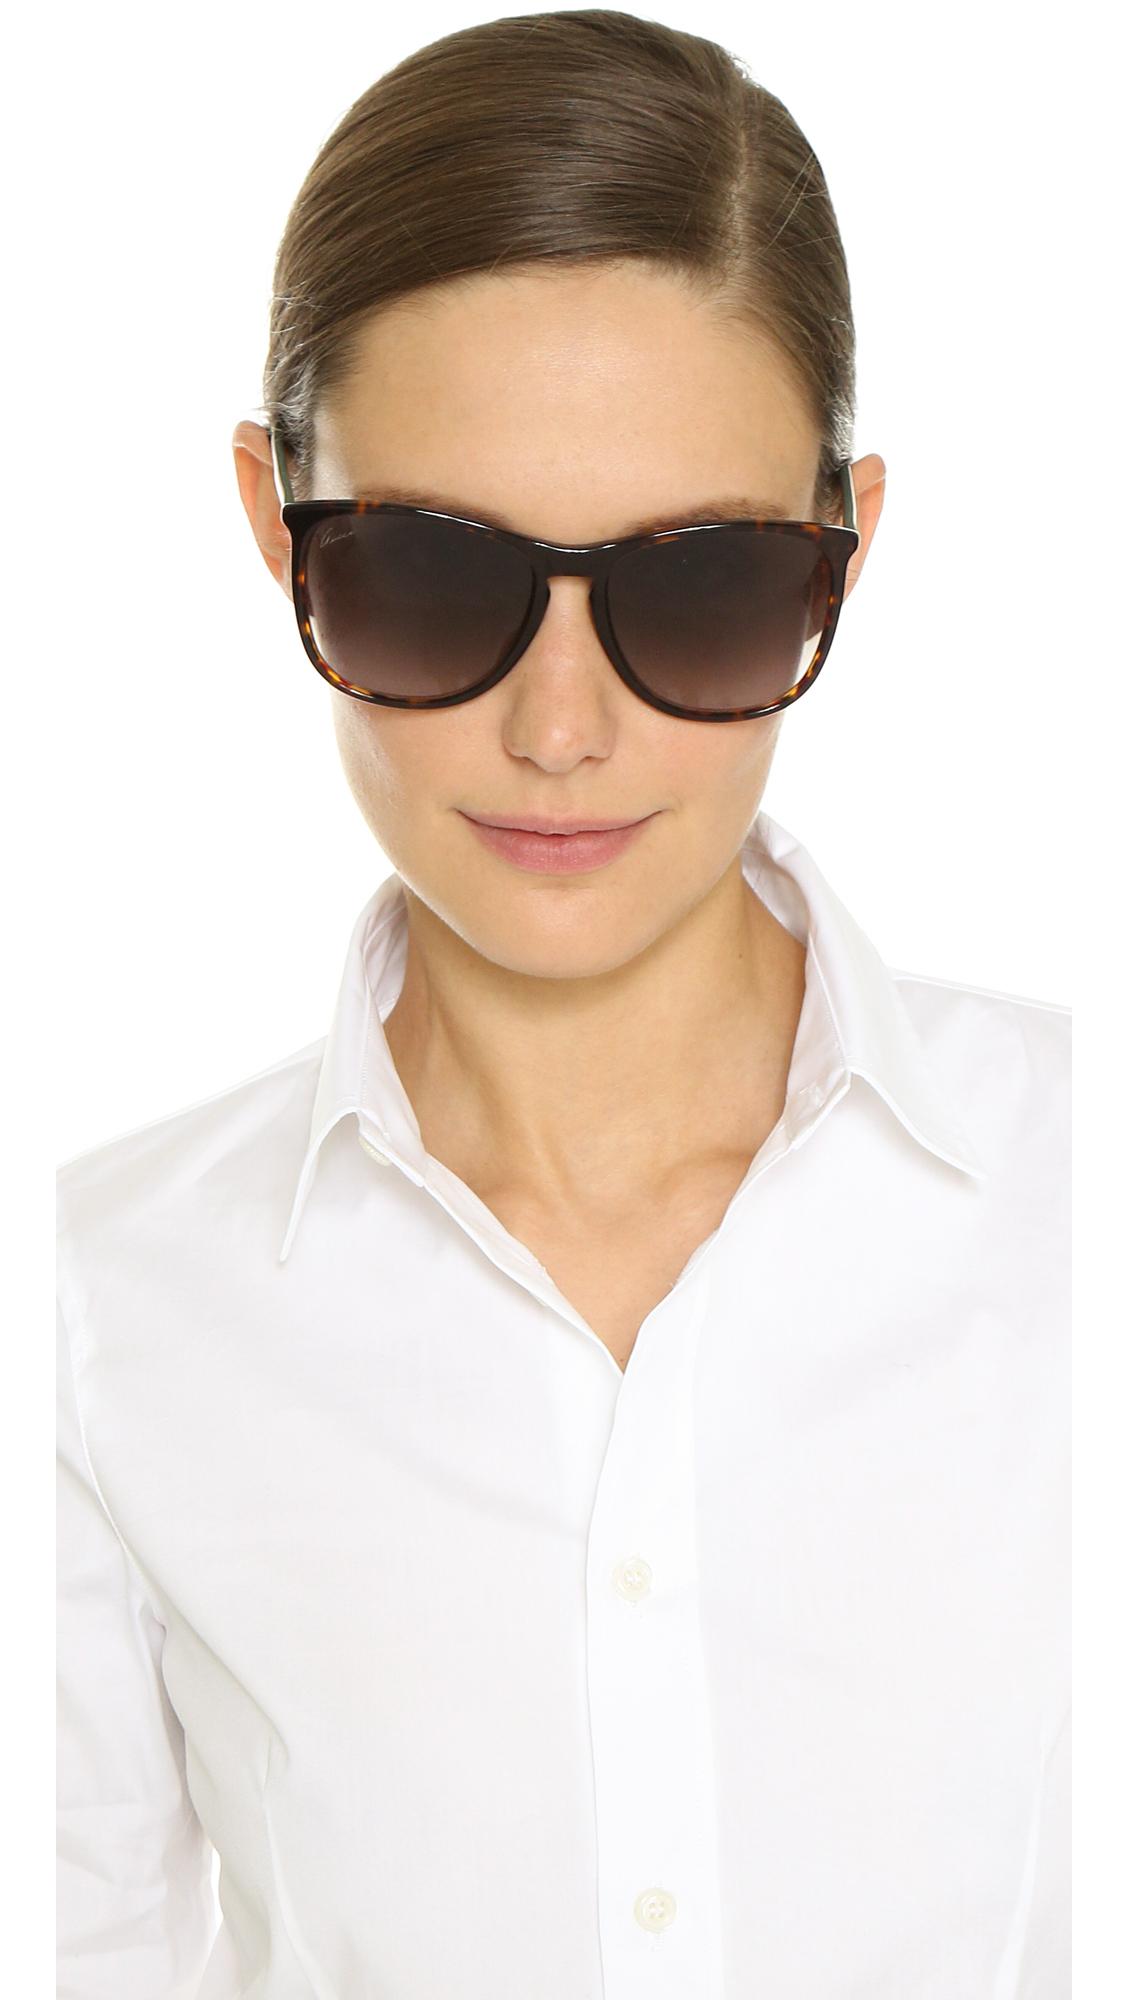 Lyst Gucci Thin Frame Sunglasses Havana Red Green